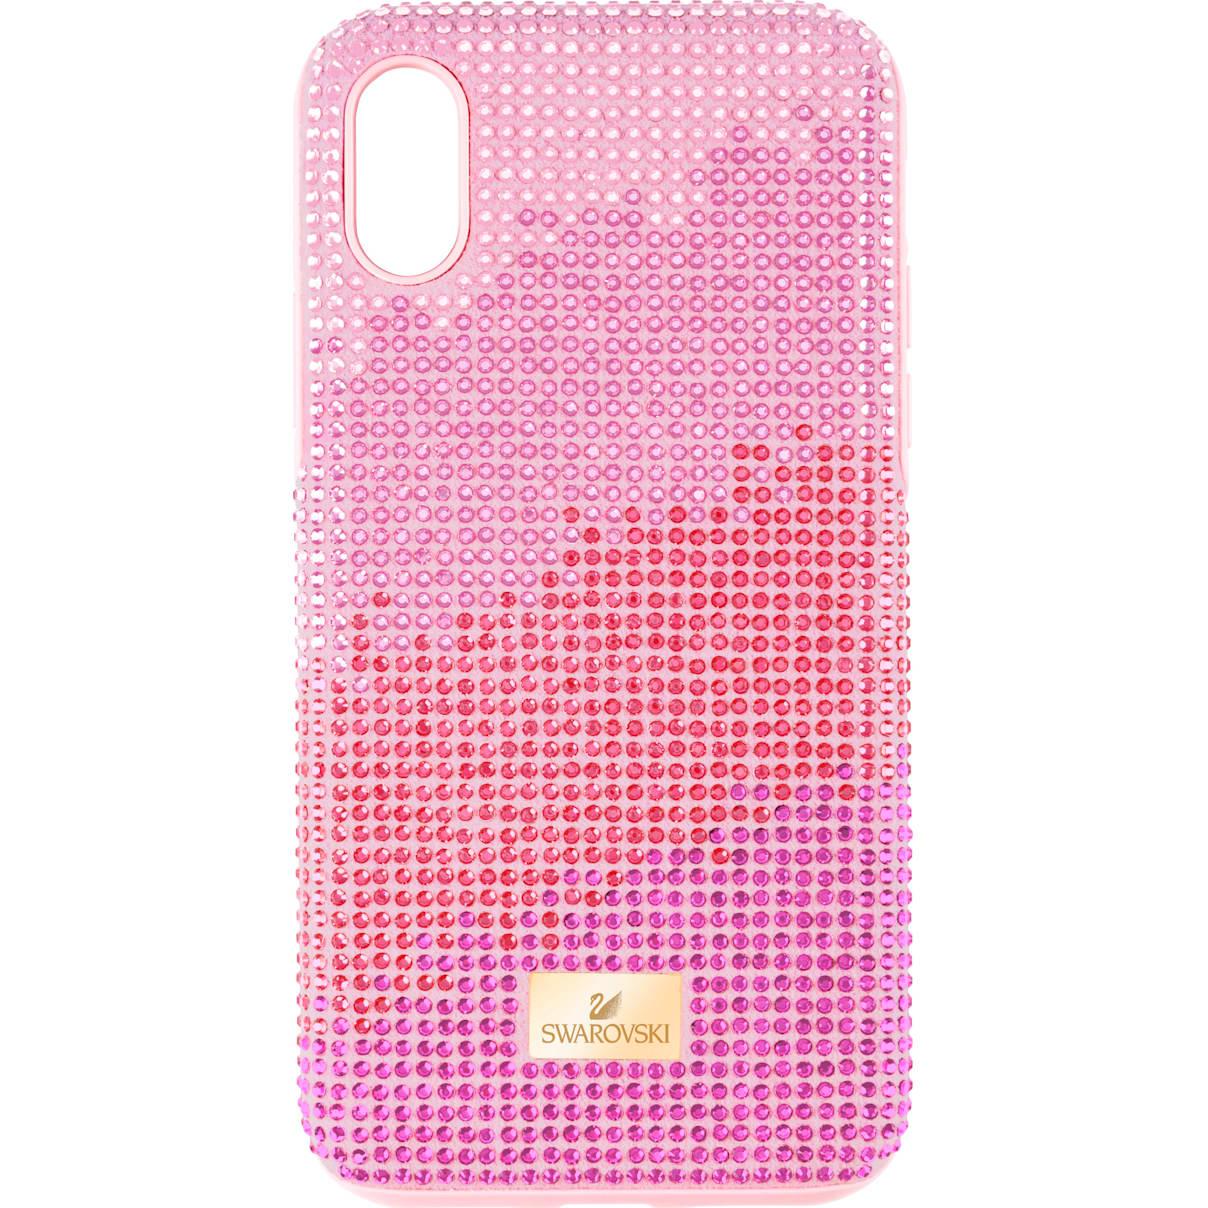 Swarovski High Love Smartphone case with Bumper, iPhone® XR, Pink